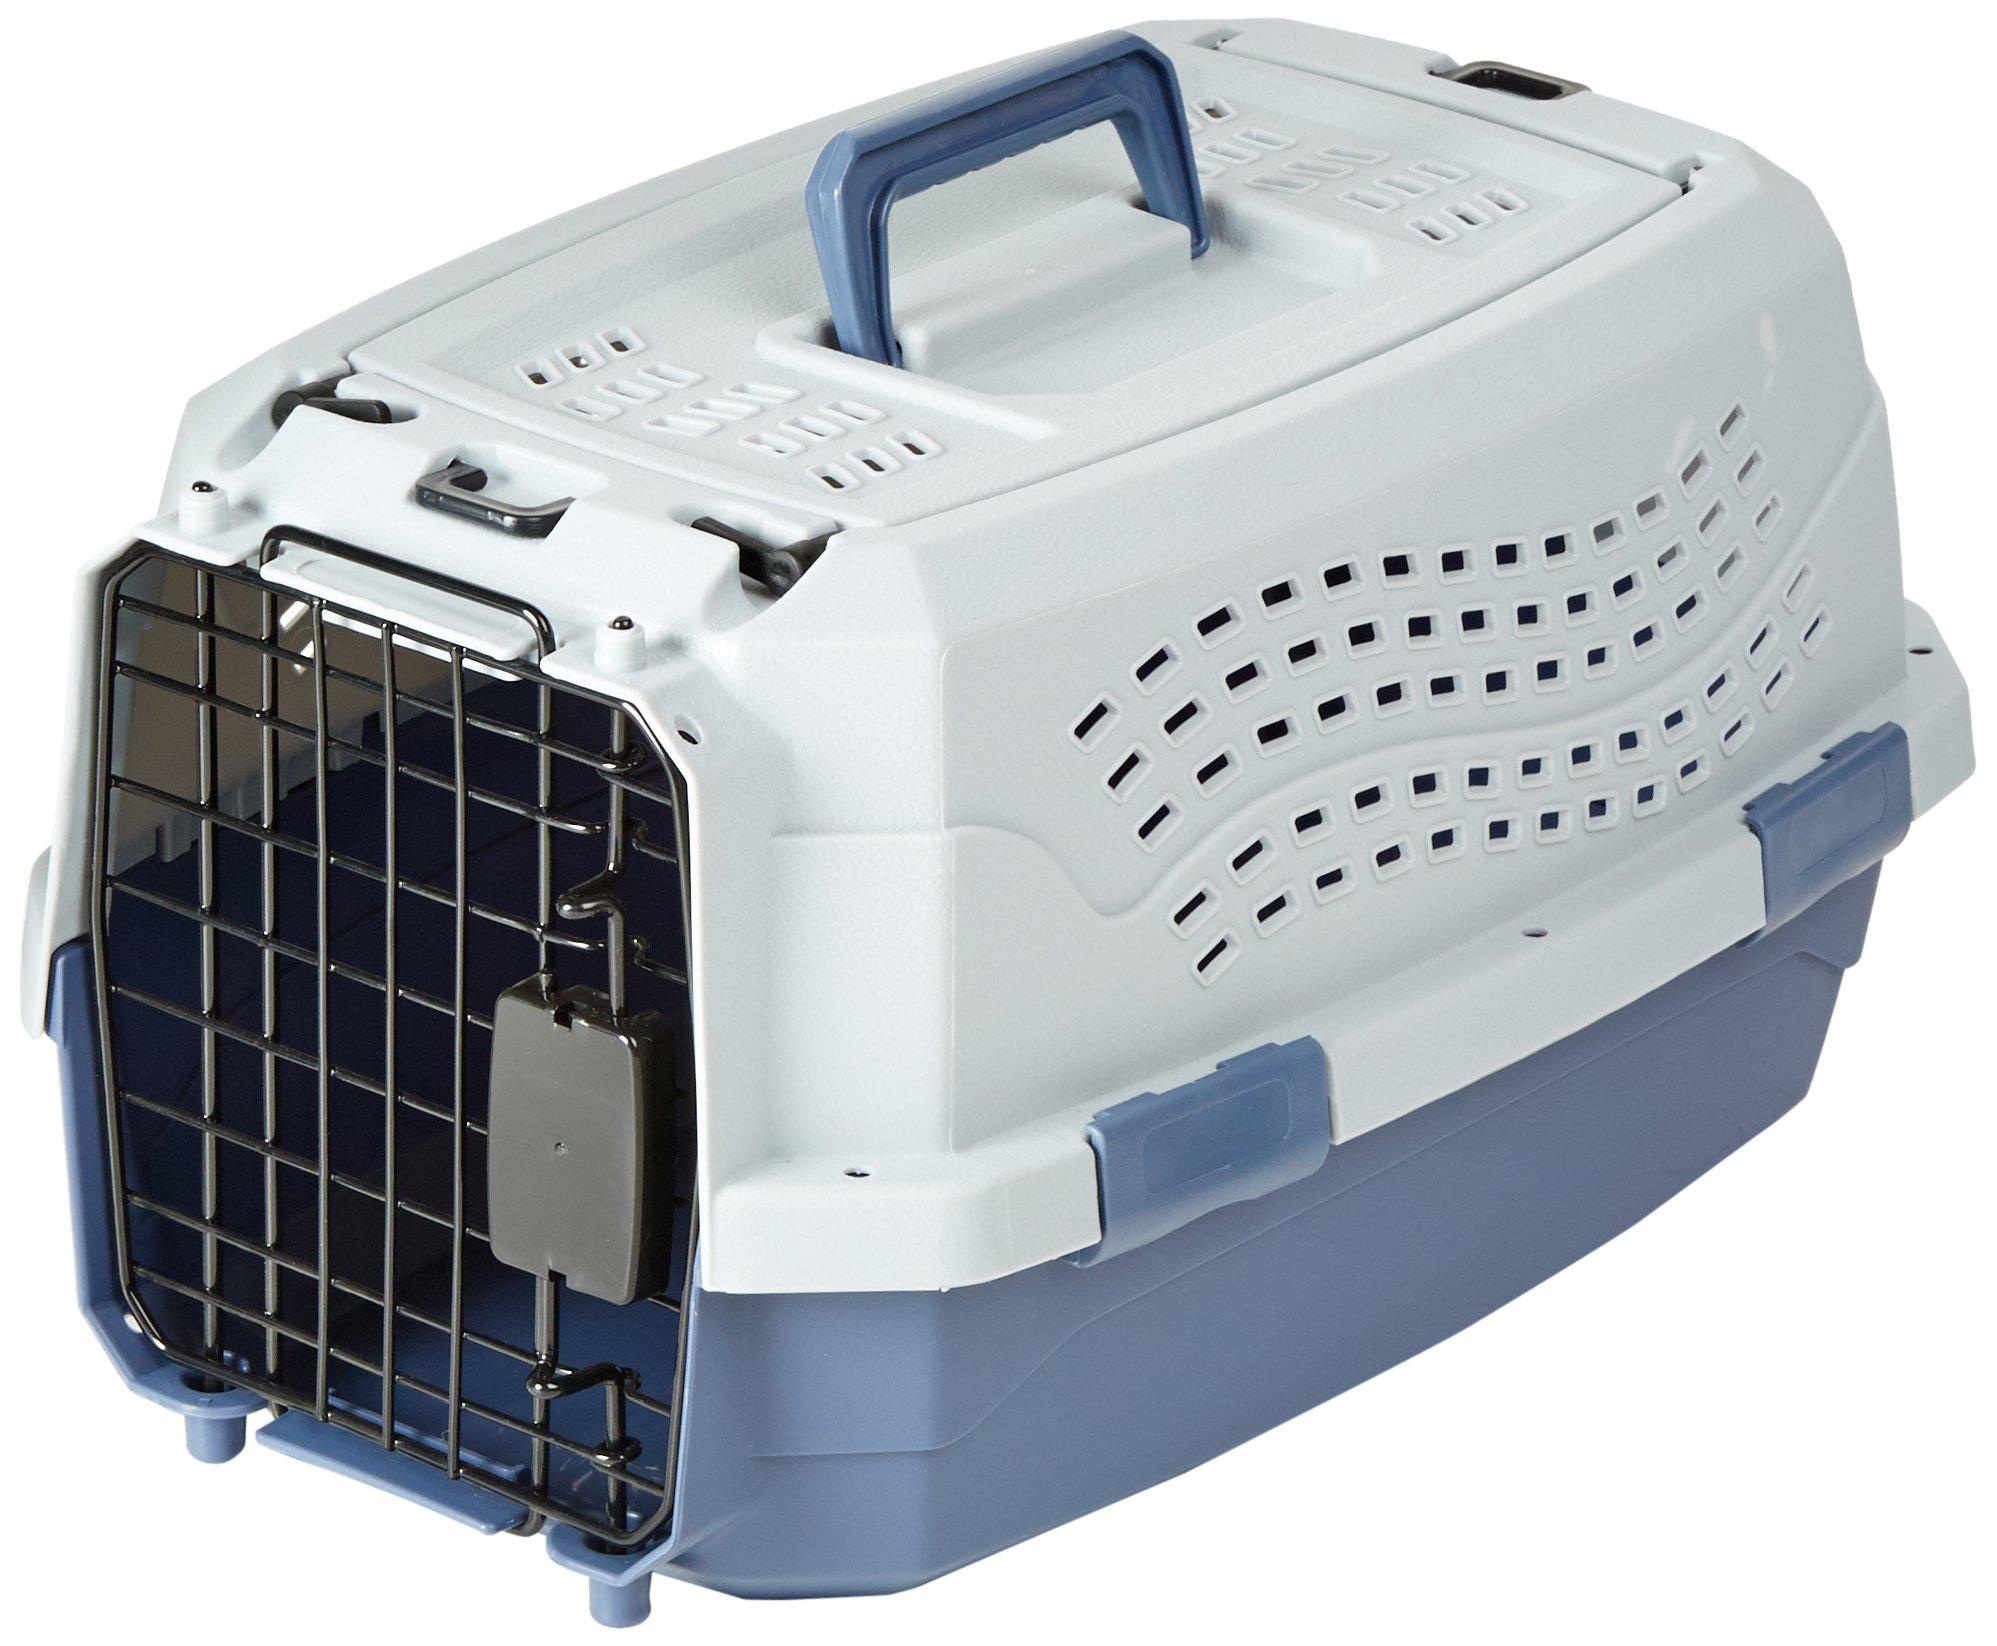 AmazonBasics 19-Inch Two-Door Top-Load Pet Kennel by AmazonBasics